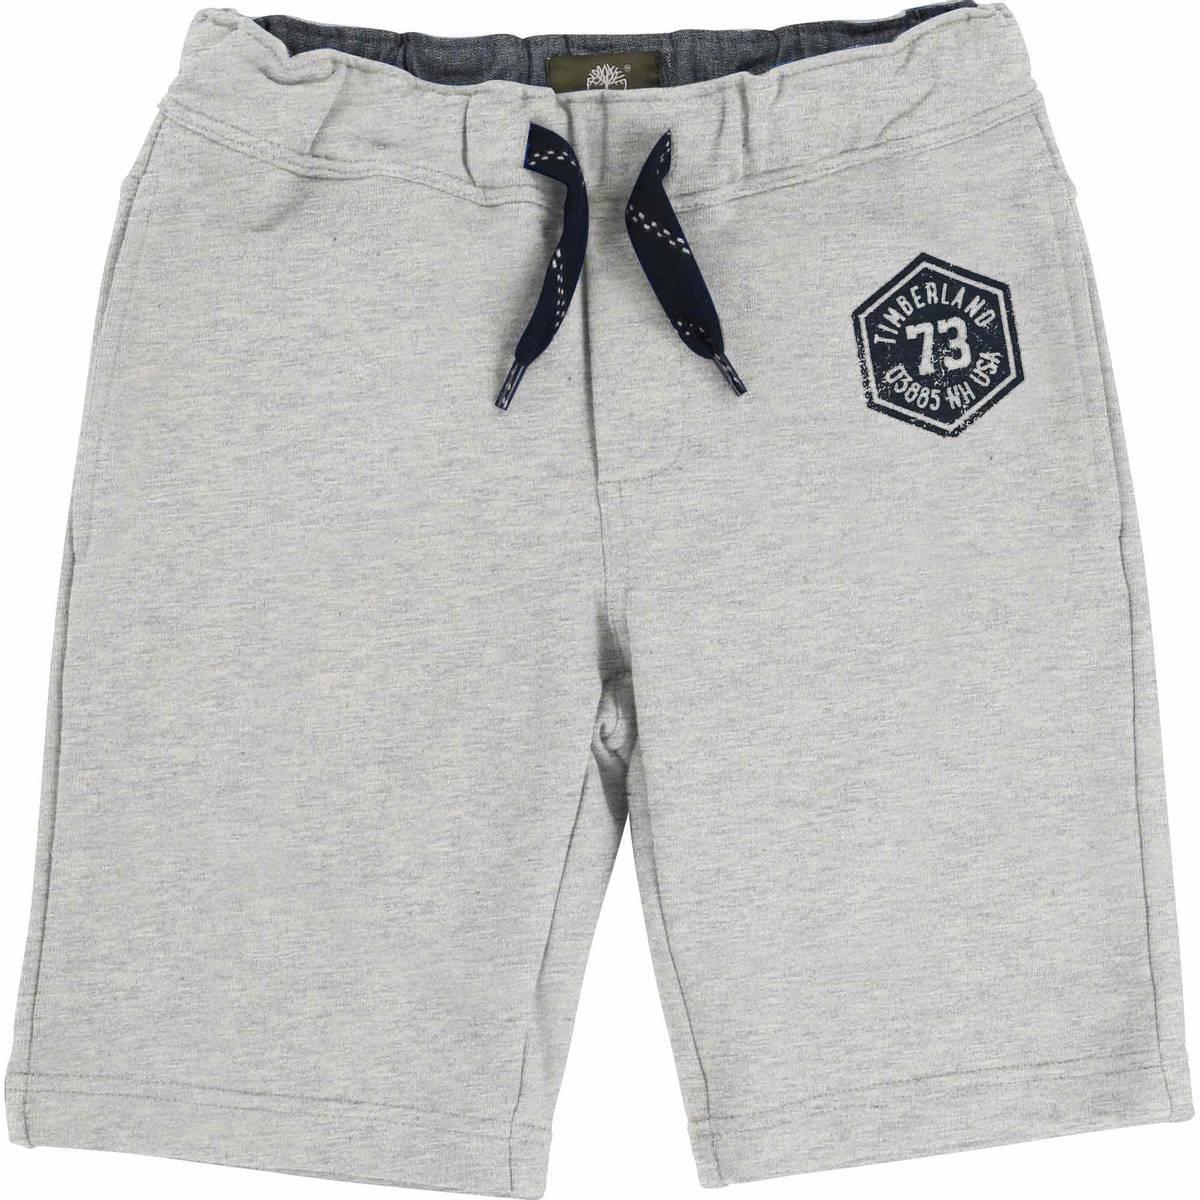 Timberland Bermuda shorts - grå